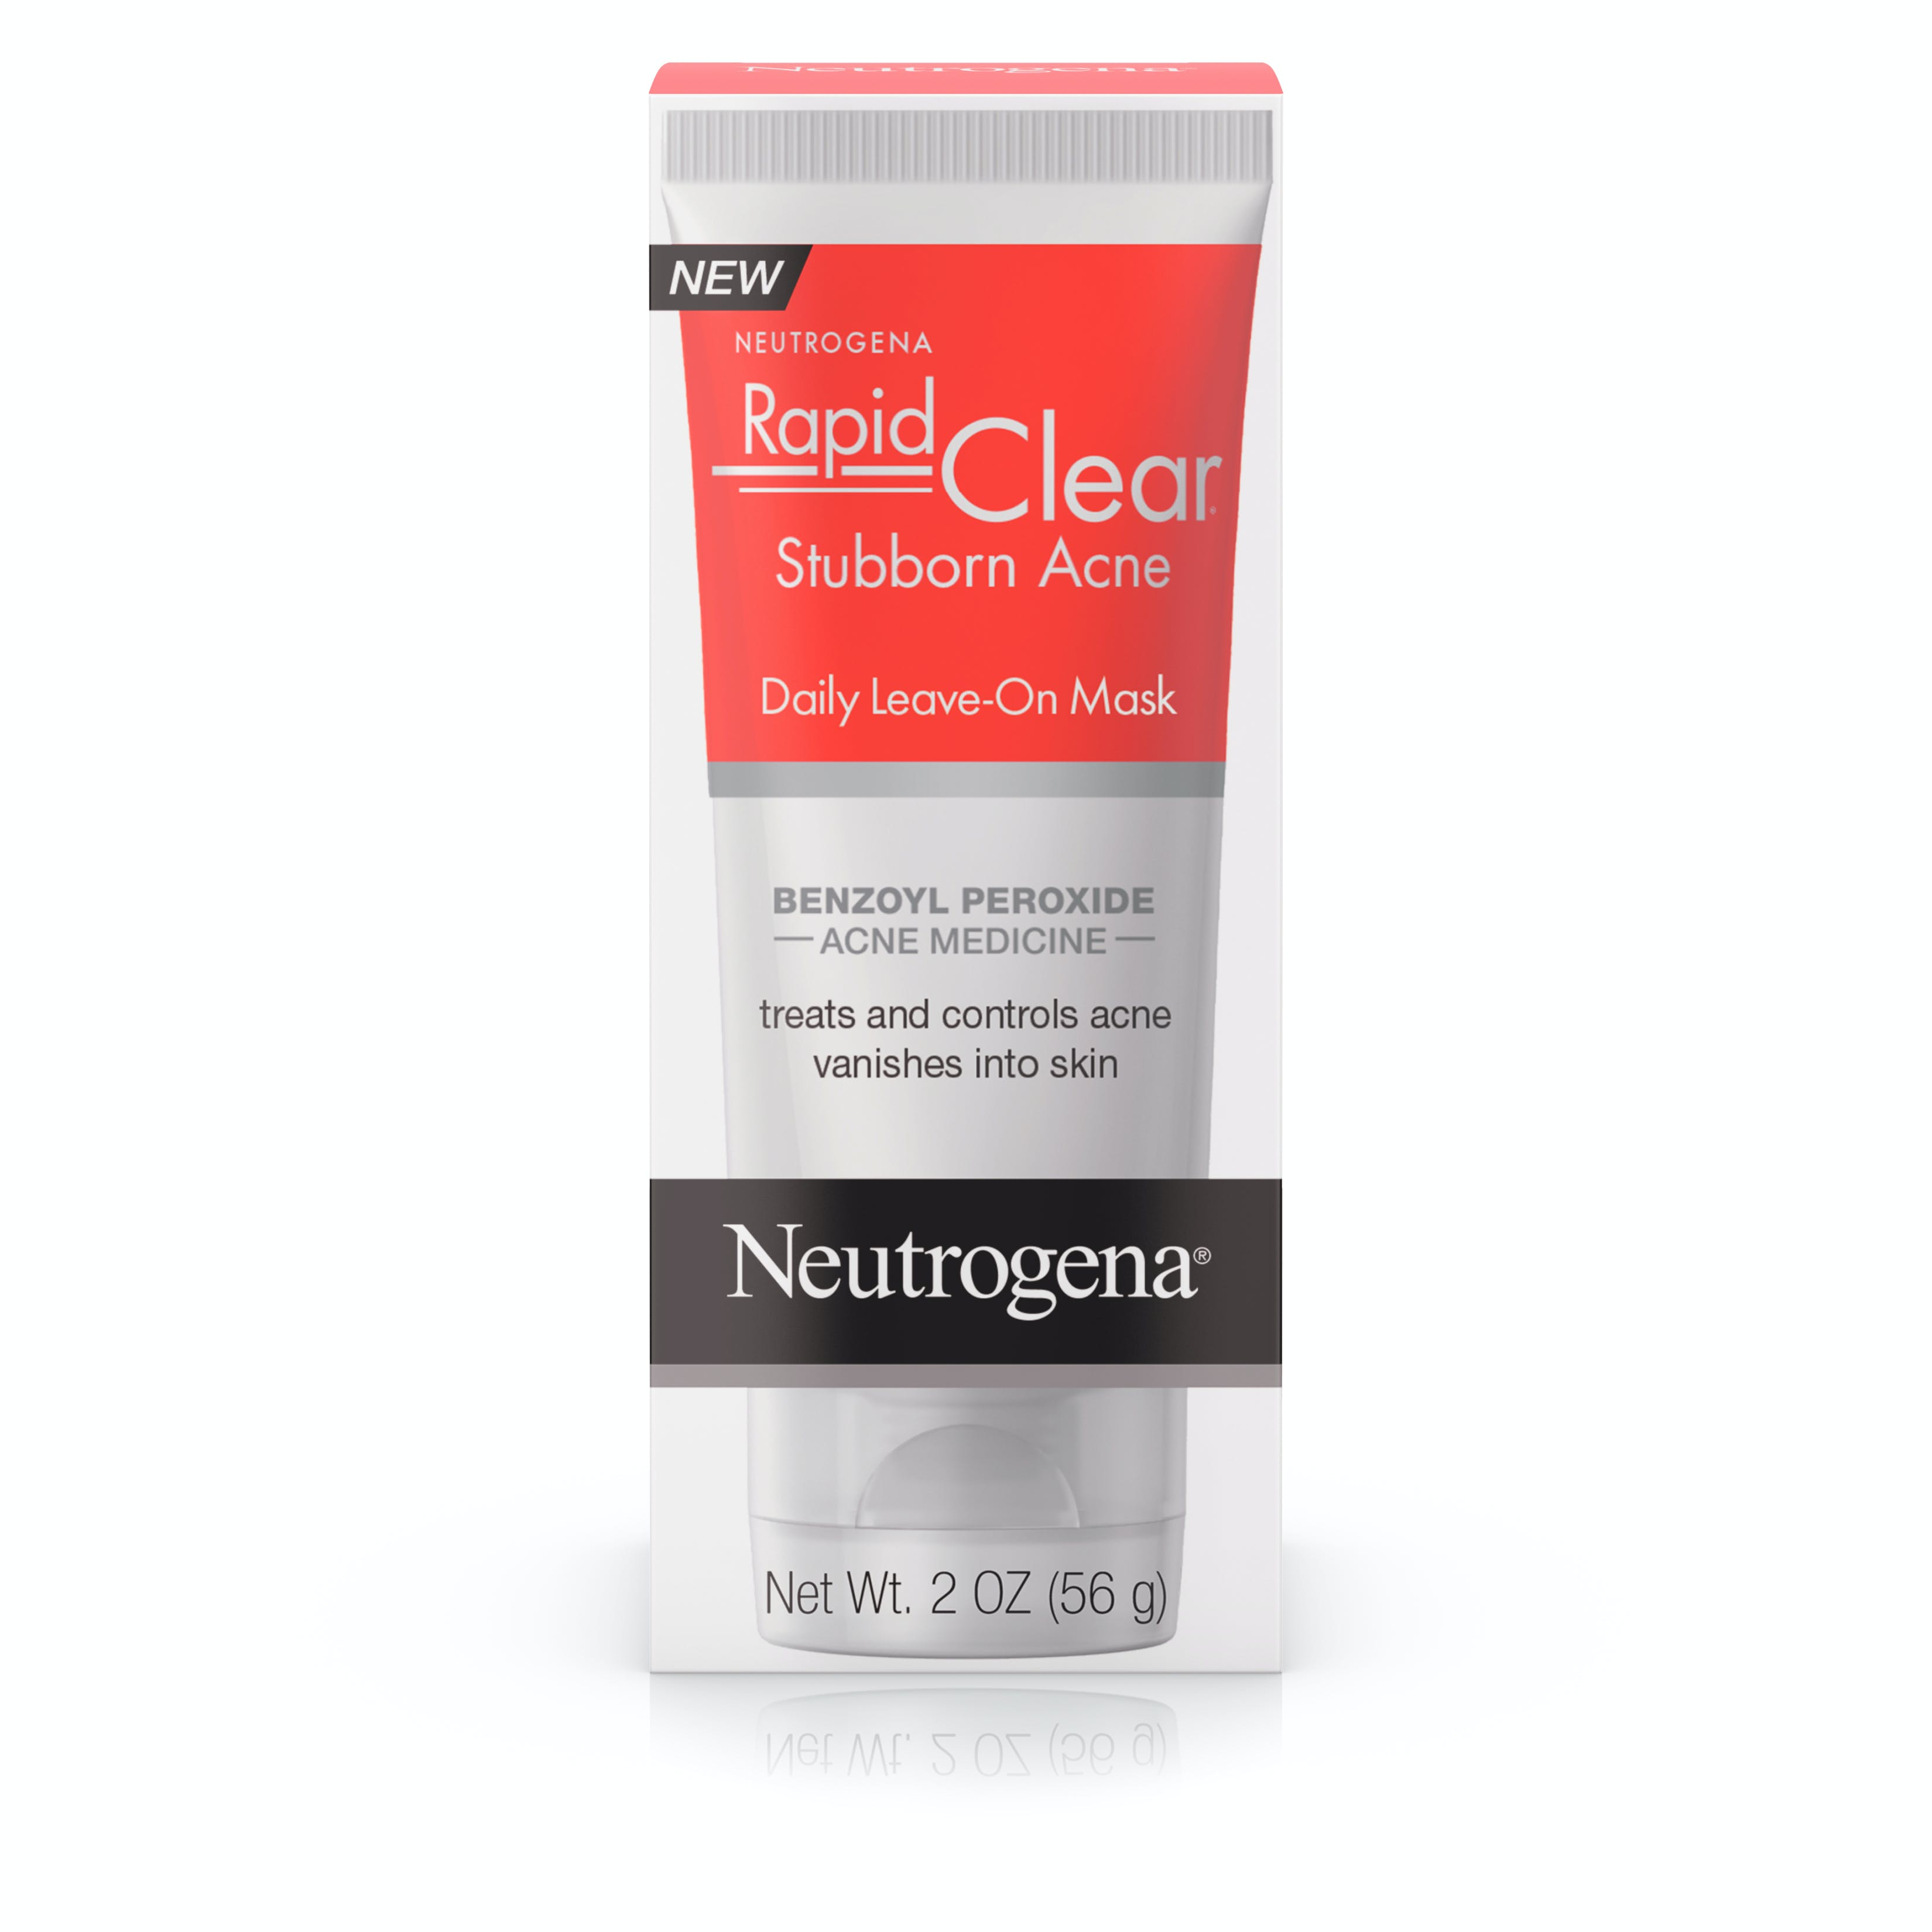 neutrogena face mask